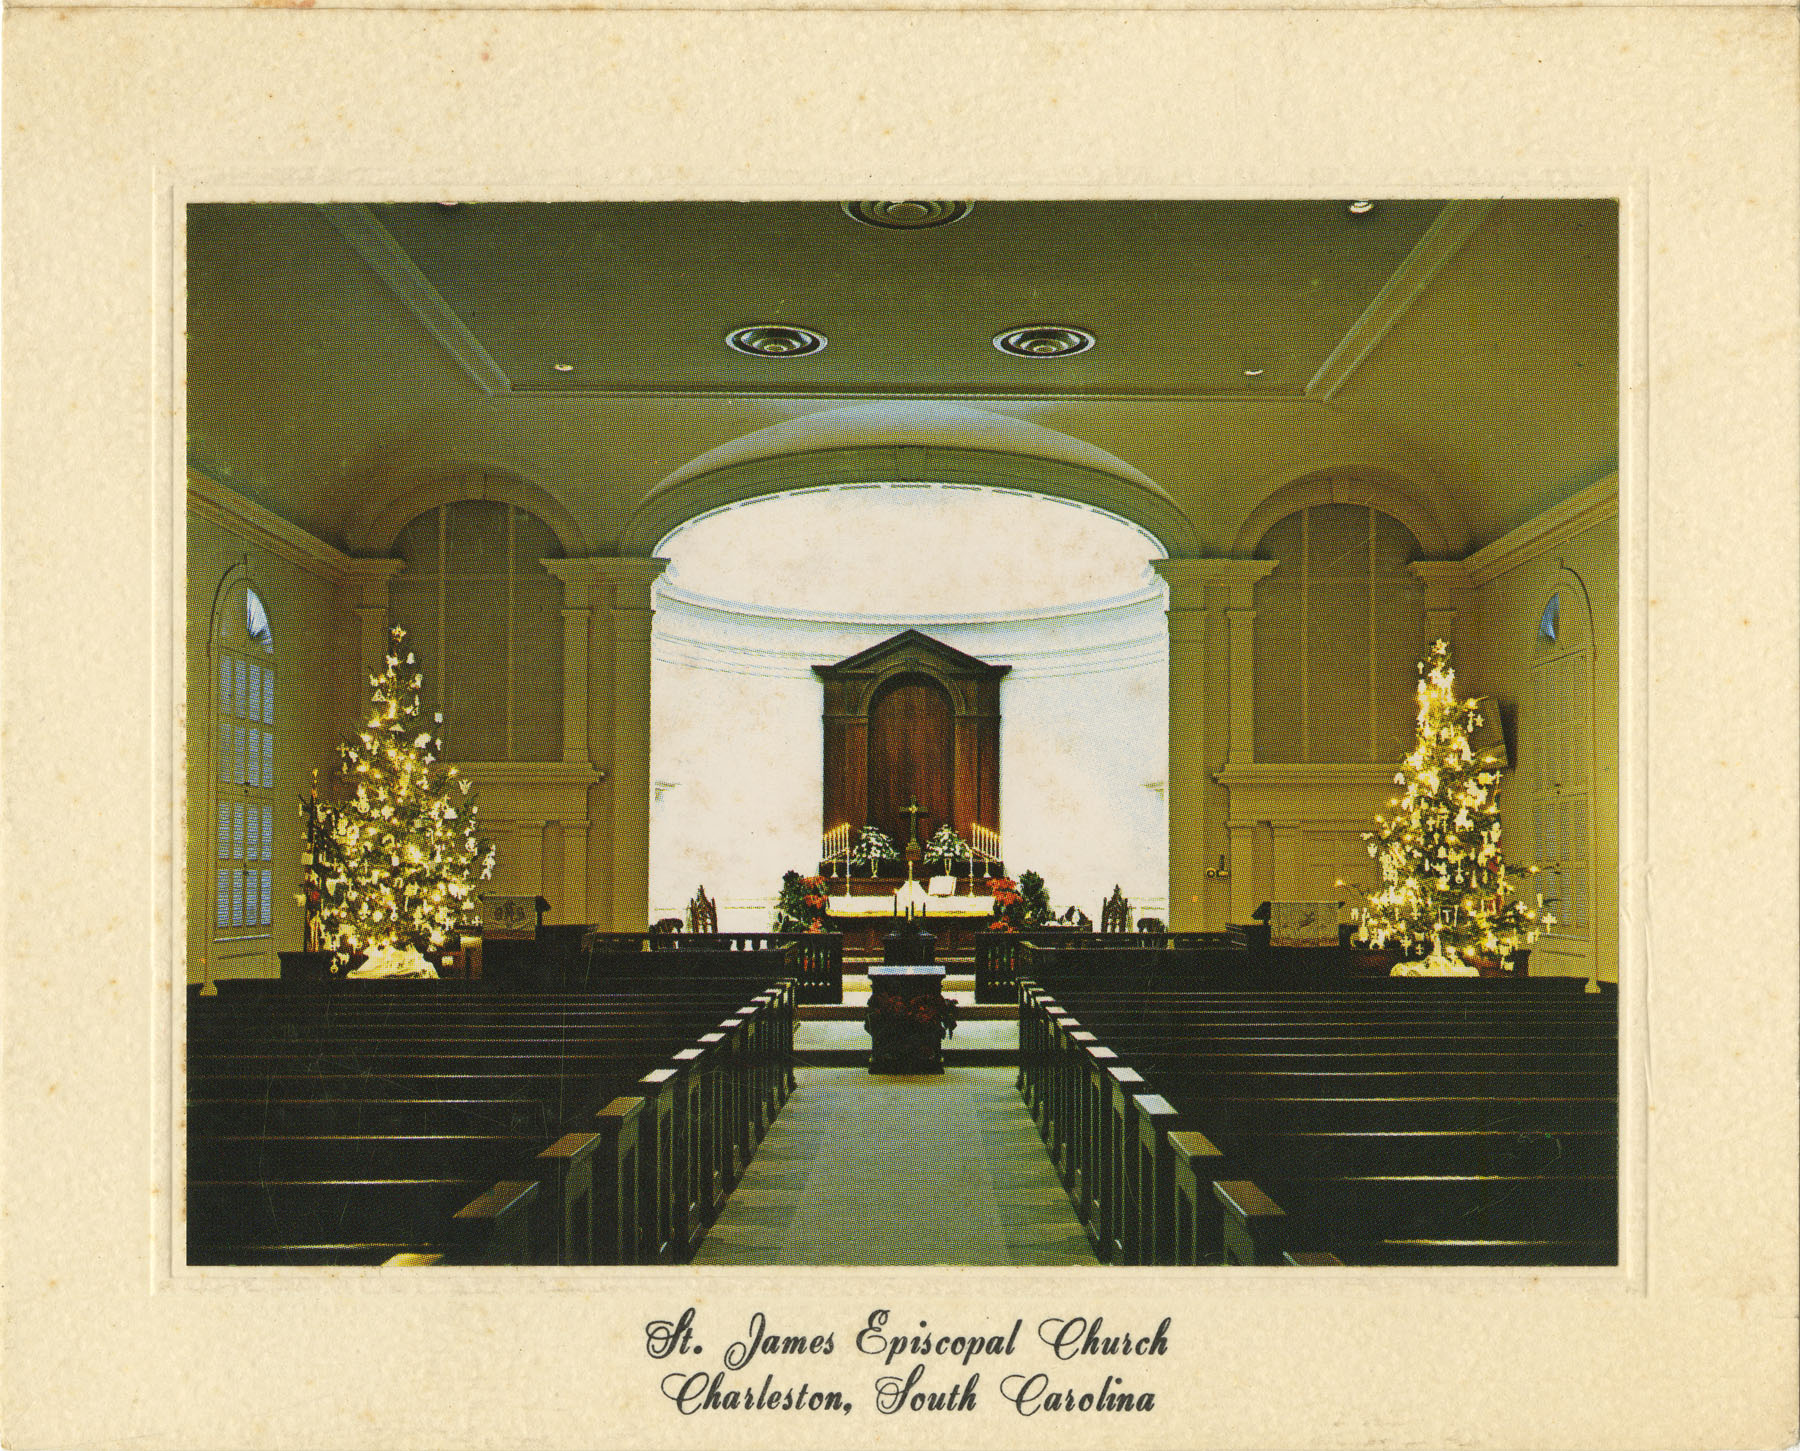 St. James Episcopal Church Interior